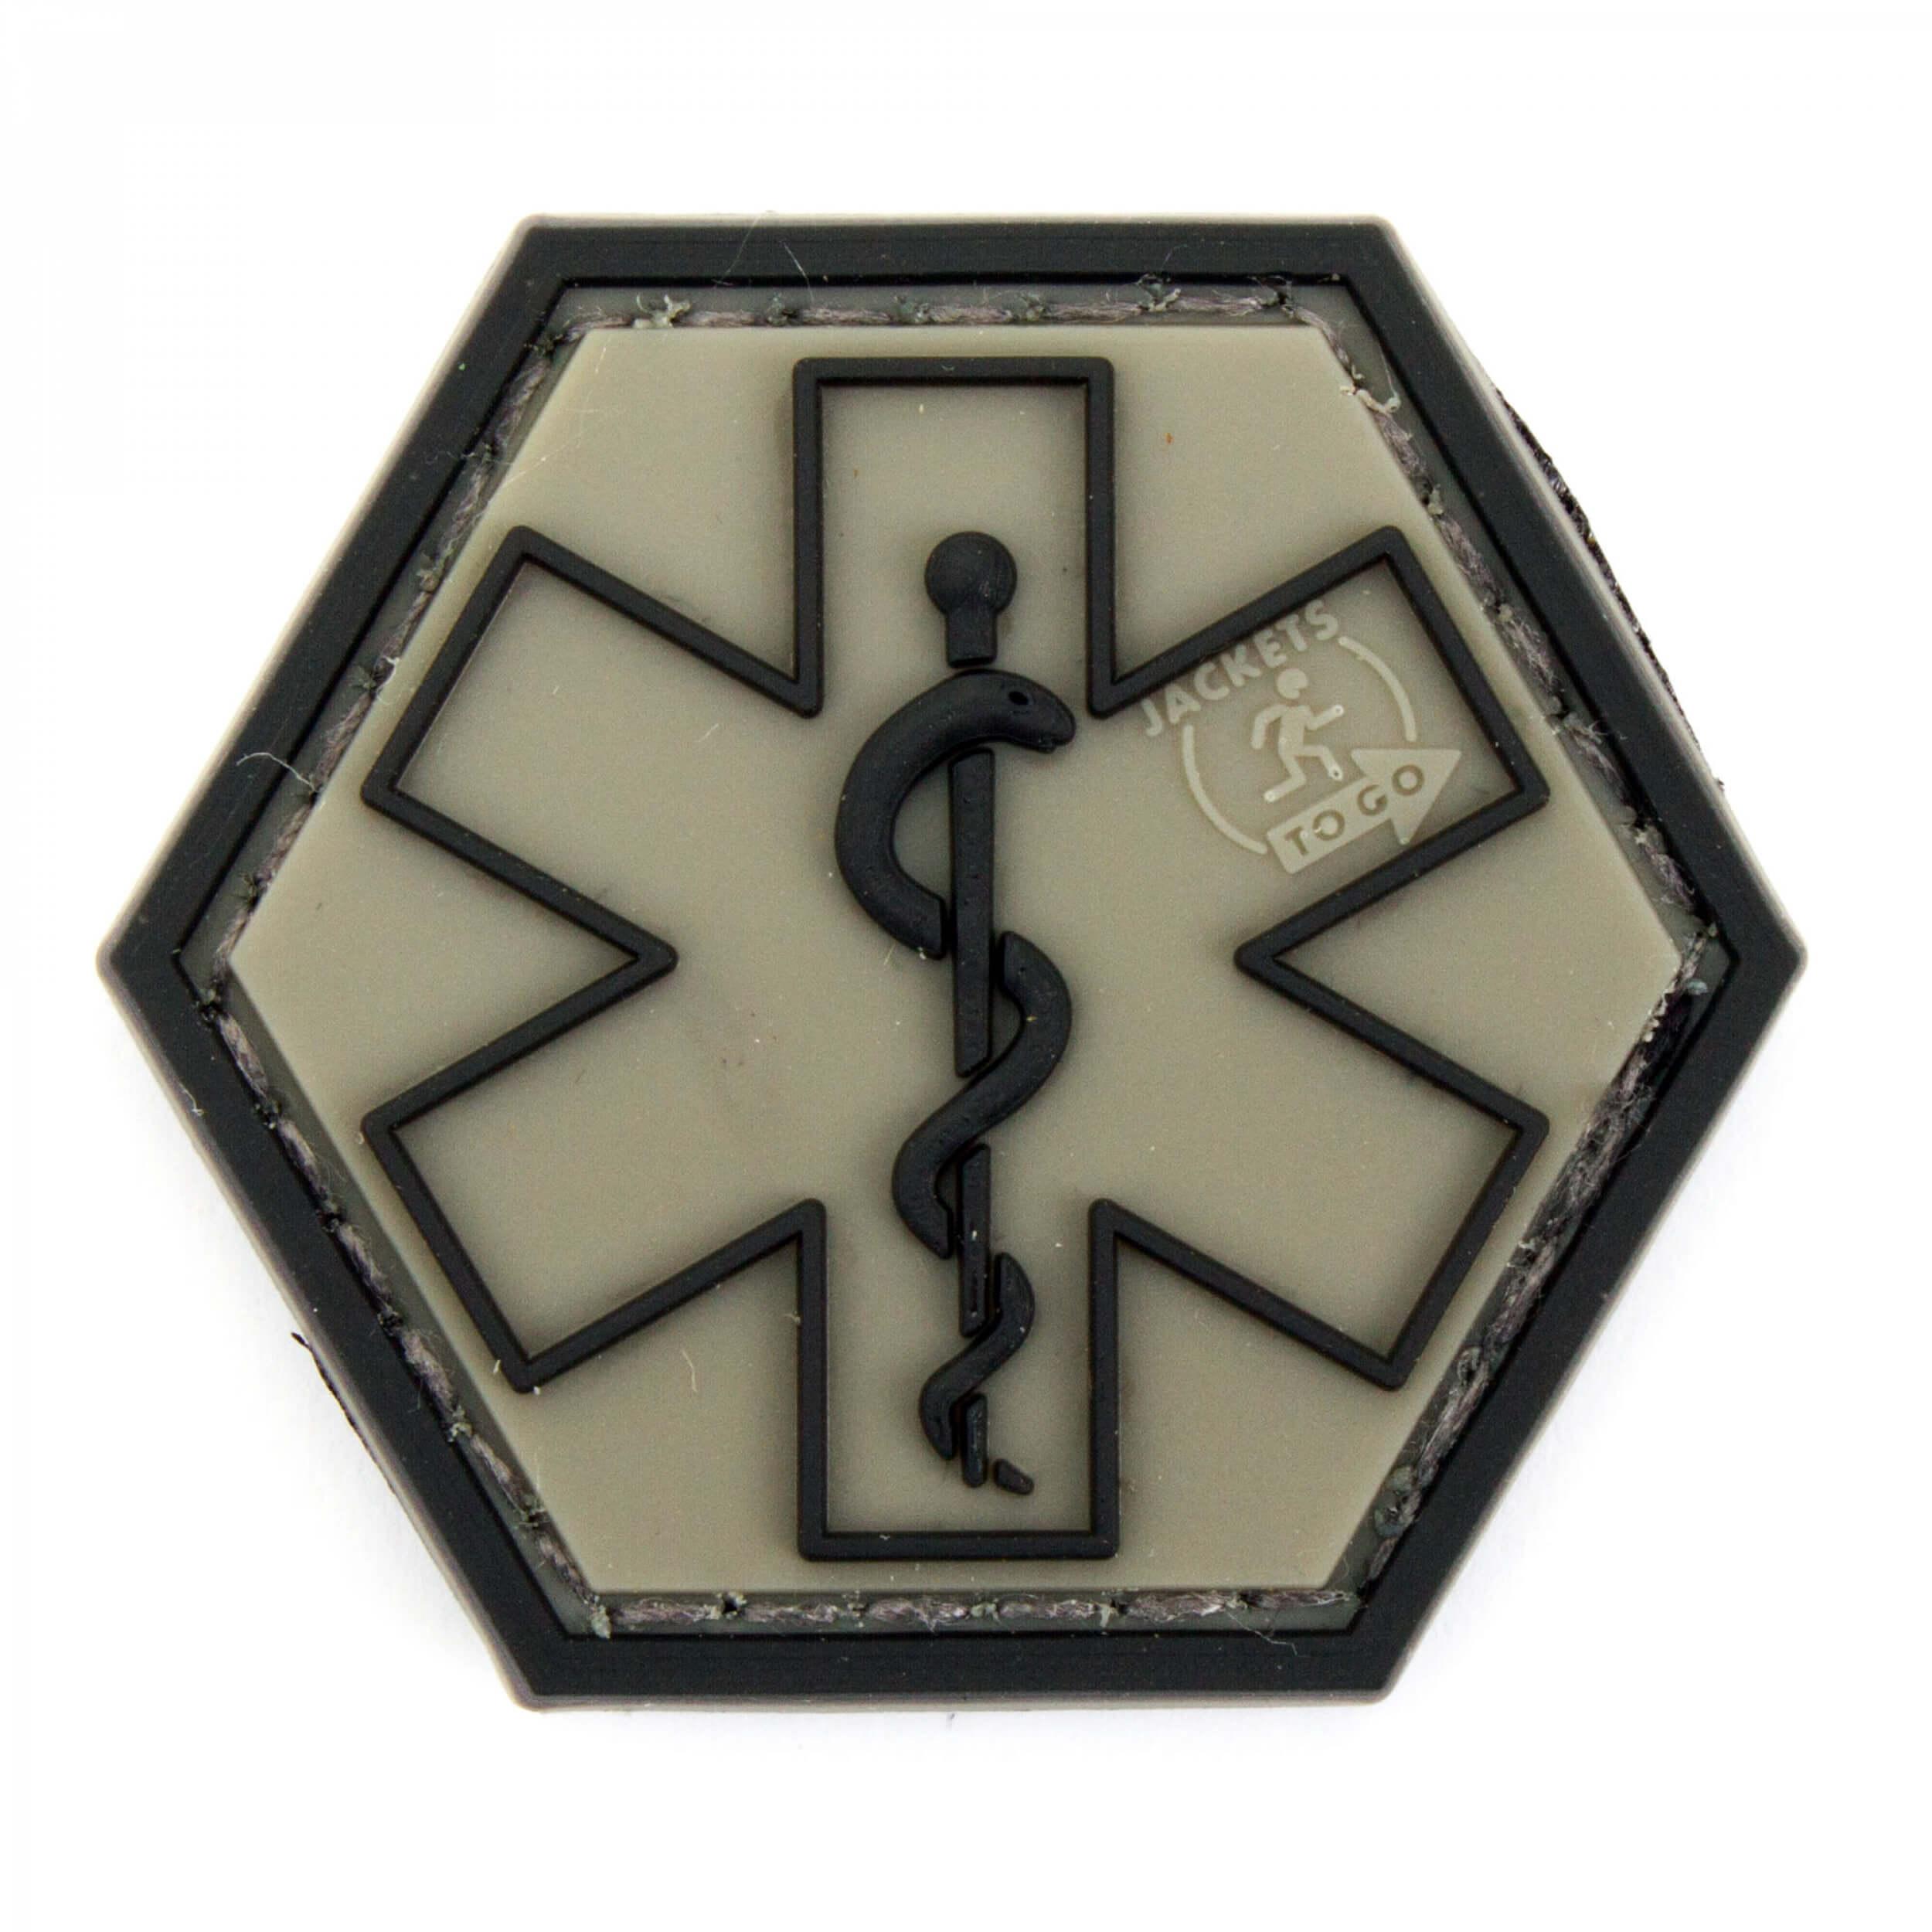 JTG PARAMEDIC, steingrau-oliv Hexagon Patch  (gb)